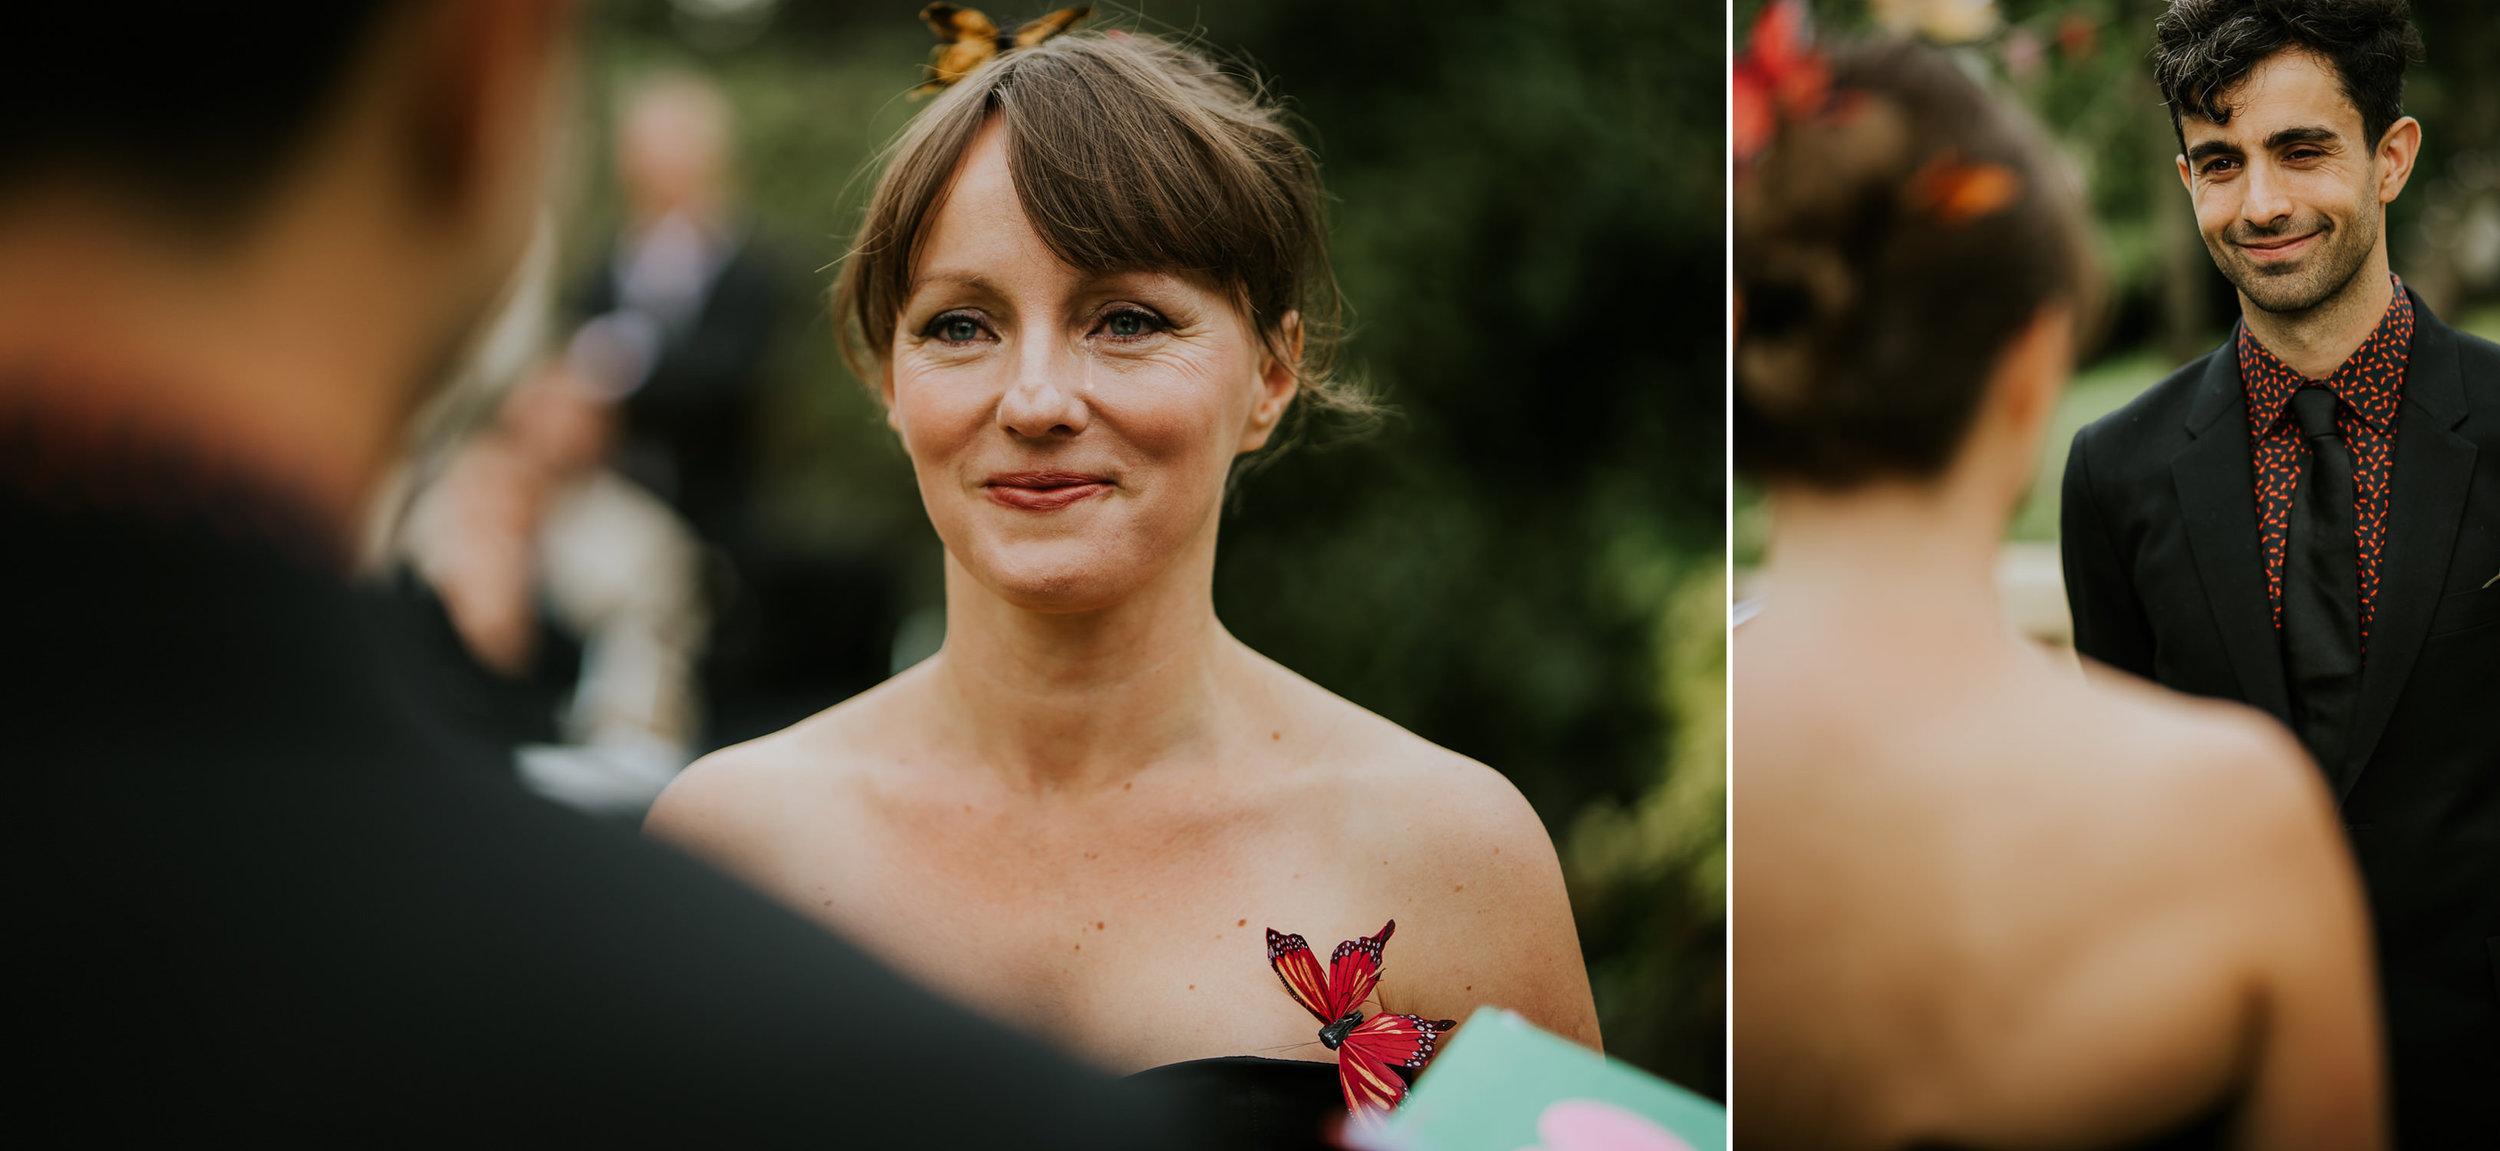 bruidsfotografie amsterdam  prachtige bruid